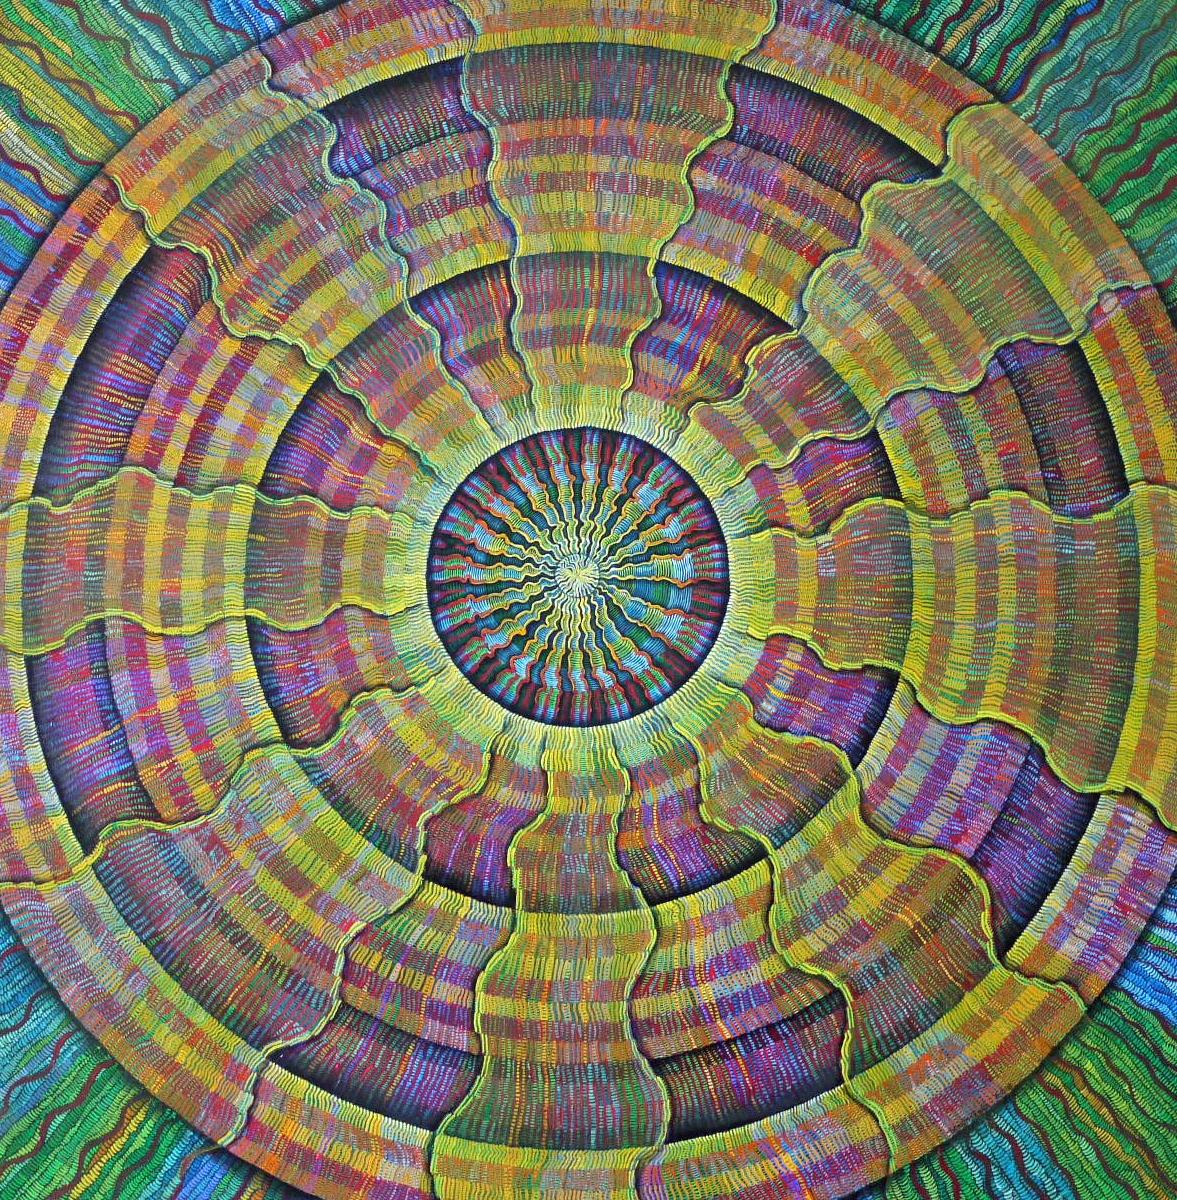 #475 - (Fibrous Series) oil on canvas 36x36, 8/18 (14)